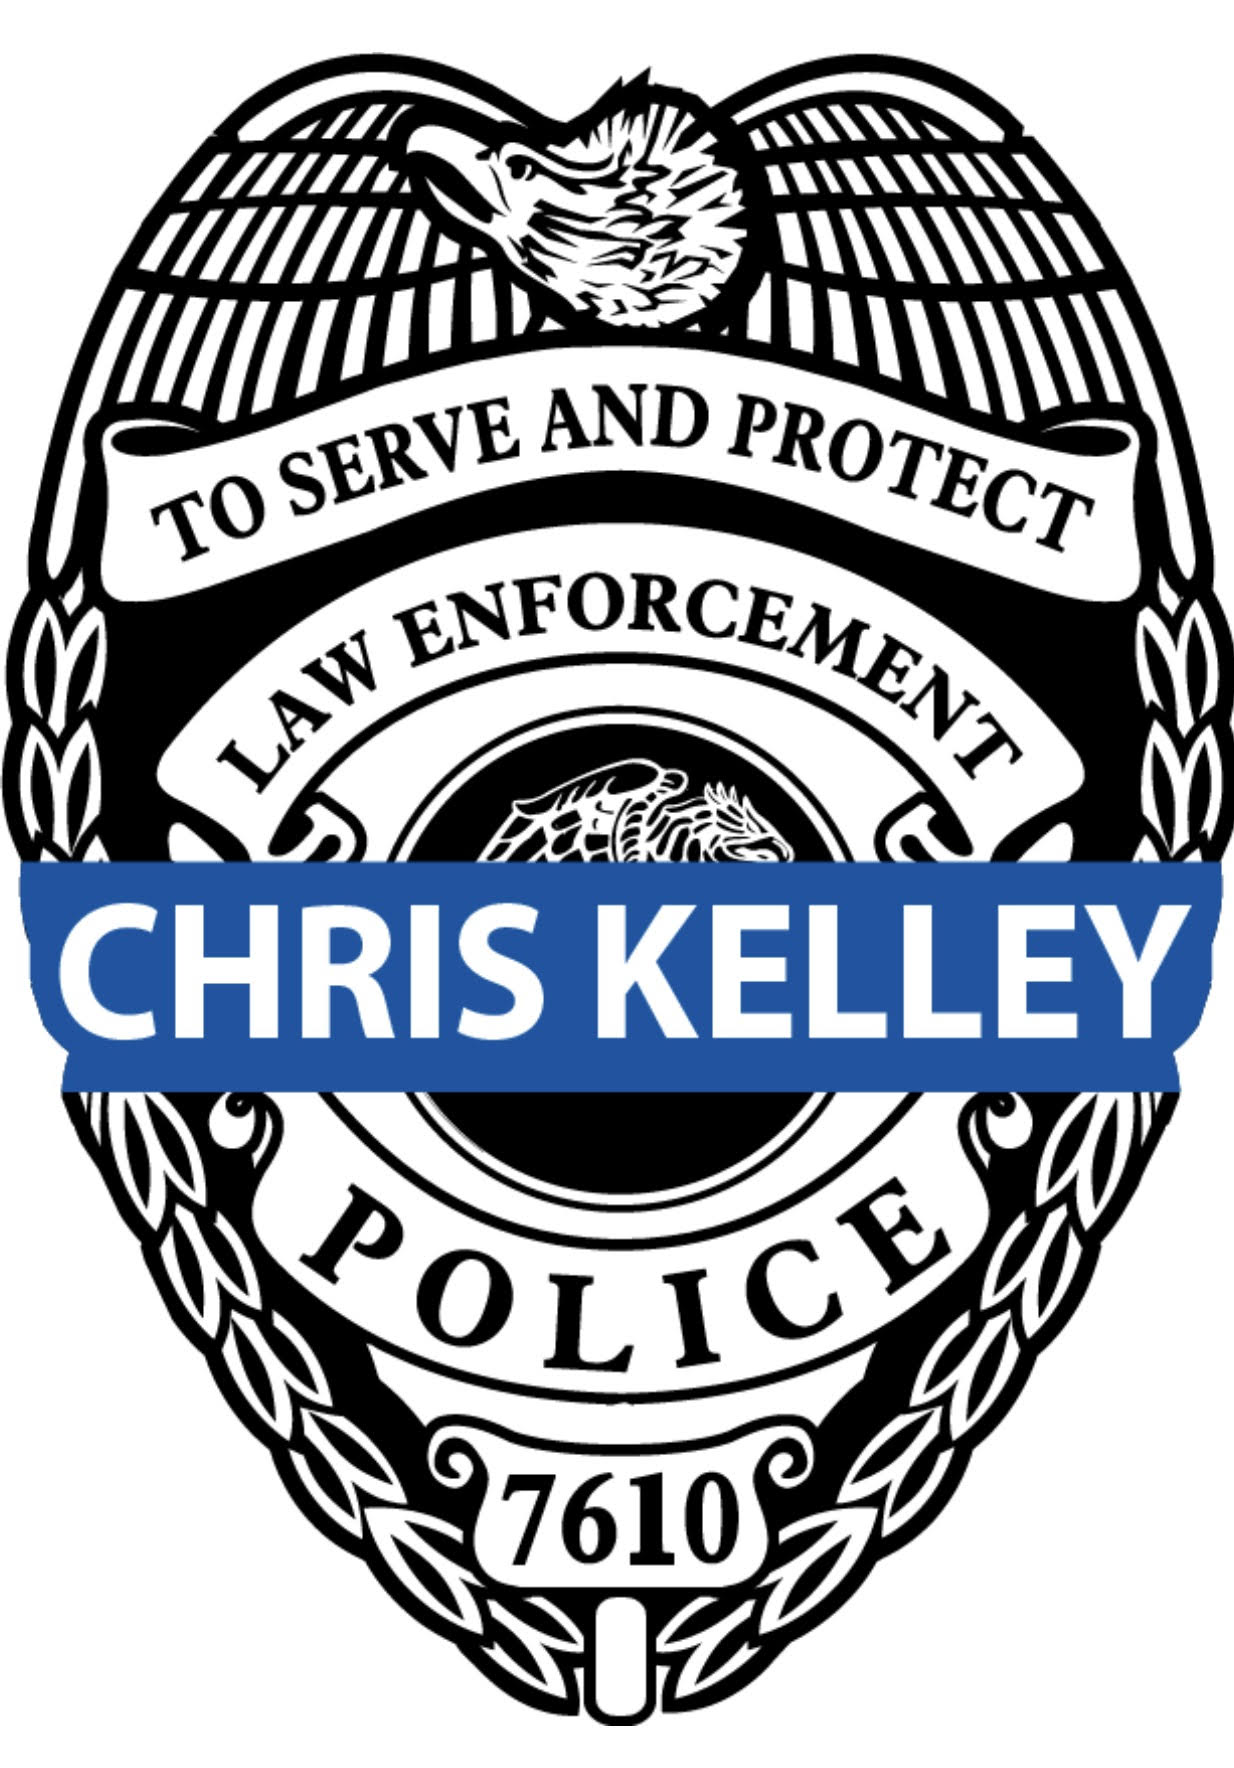 Chris Kelley Foundation